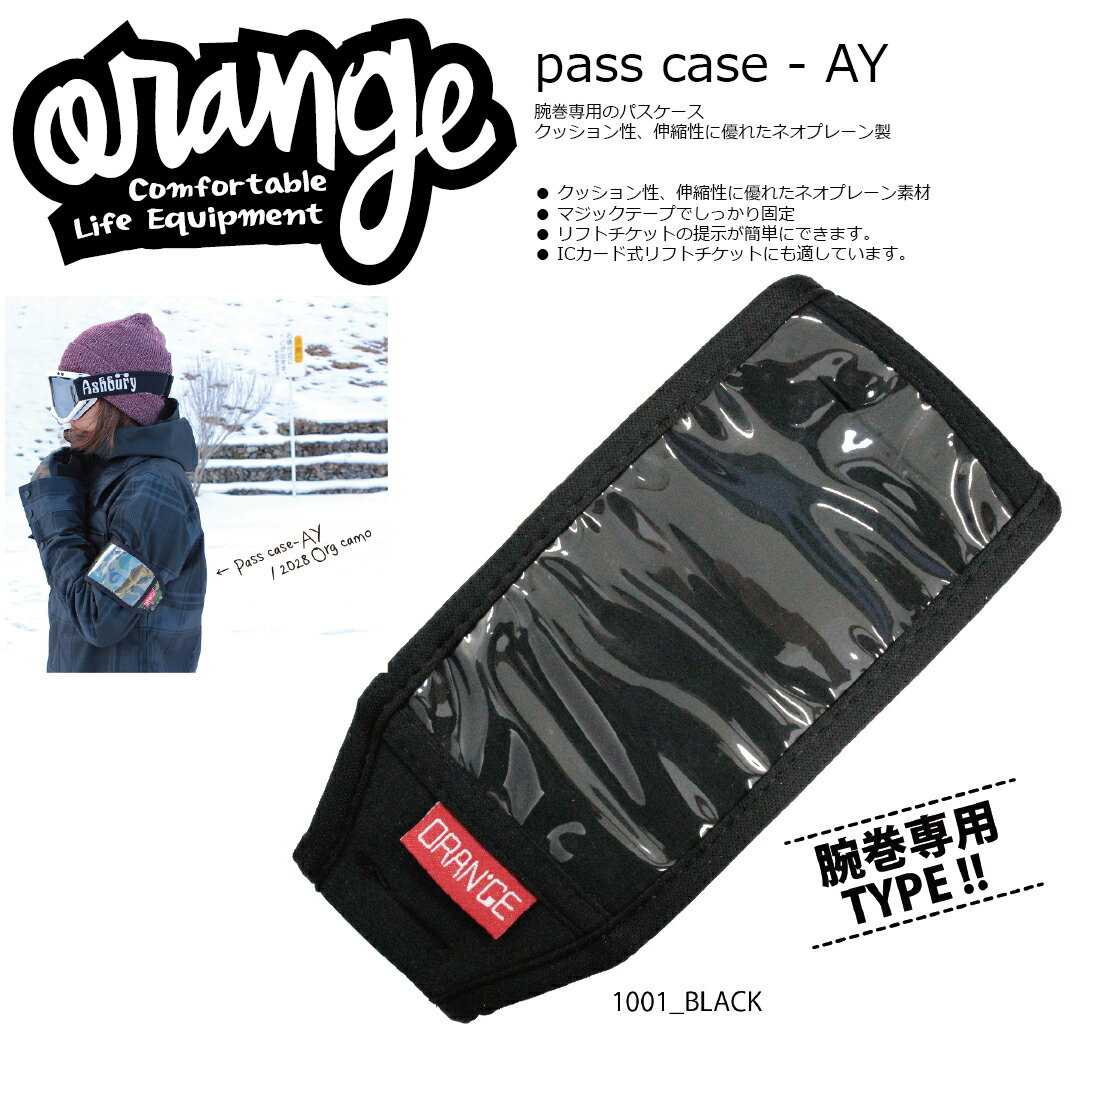 Oran'ge Pass-Case AY 1001 BLACK オレンジ パスケース エーワイ うで装着タイプ ヨコ 2017 2017-18